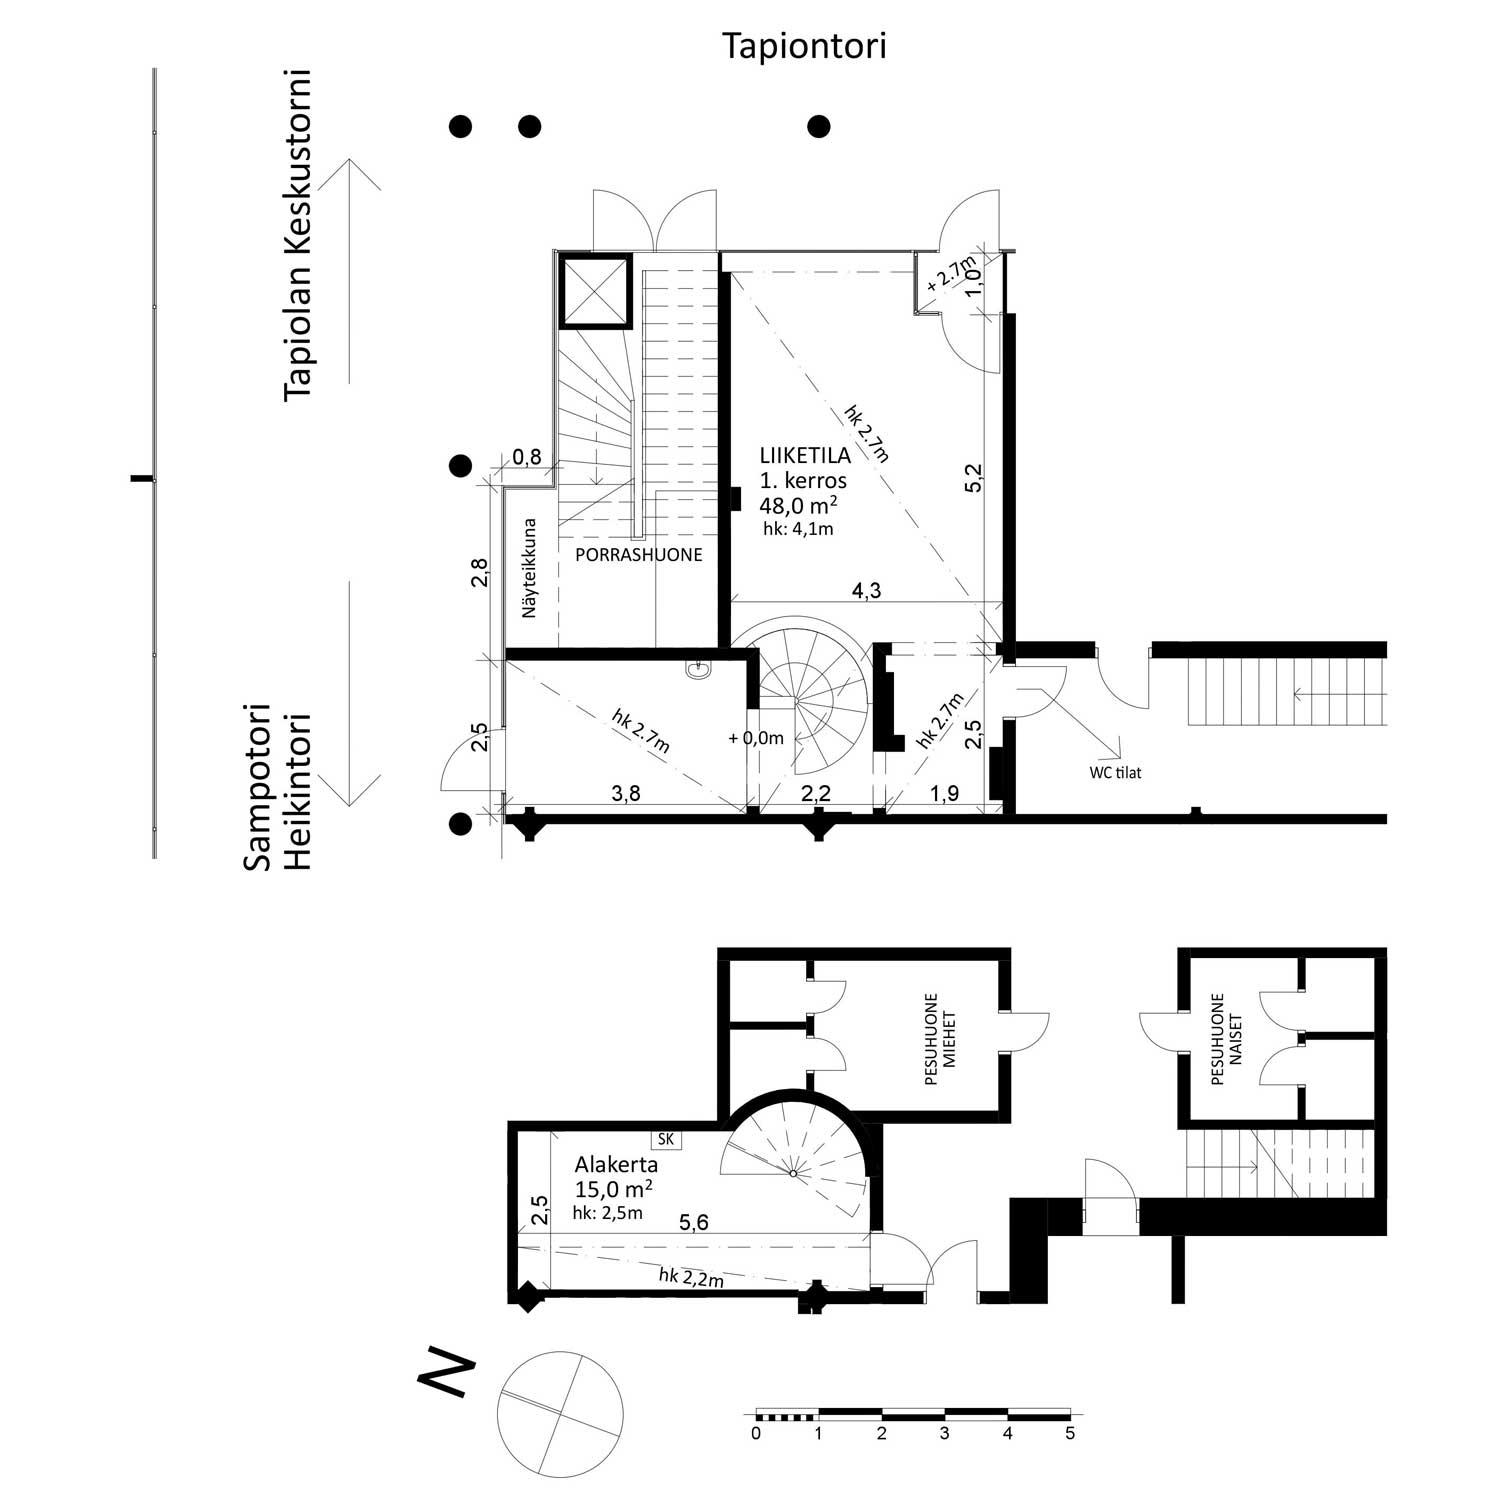 Tapiontori3B_layout_alt1_20171117_clippedx.jpg